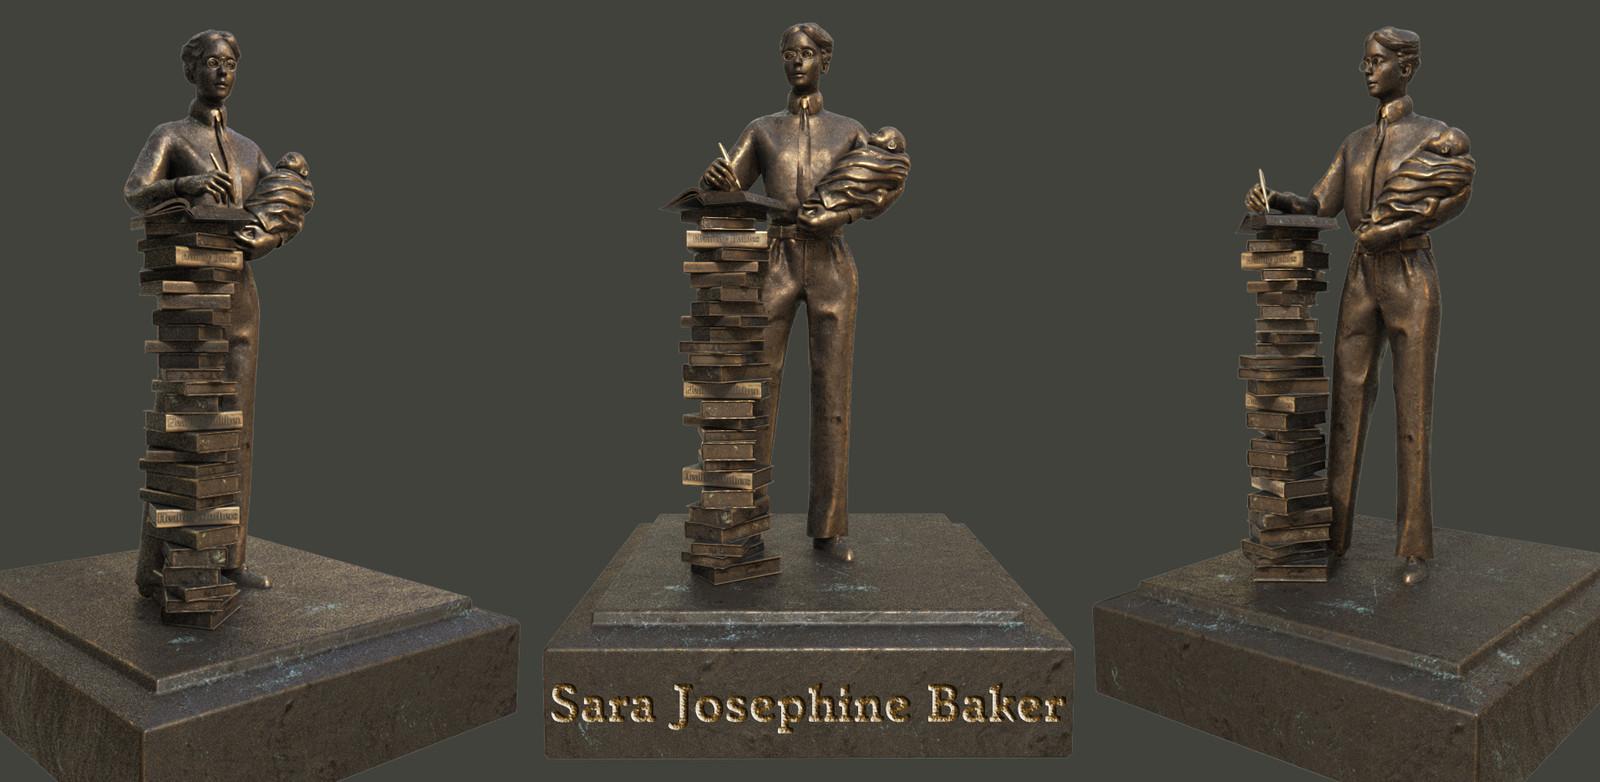 Sara Josephine Baker, physician & pioneer of preventative medicine.